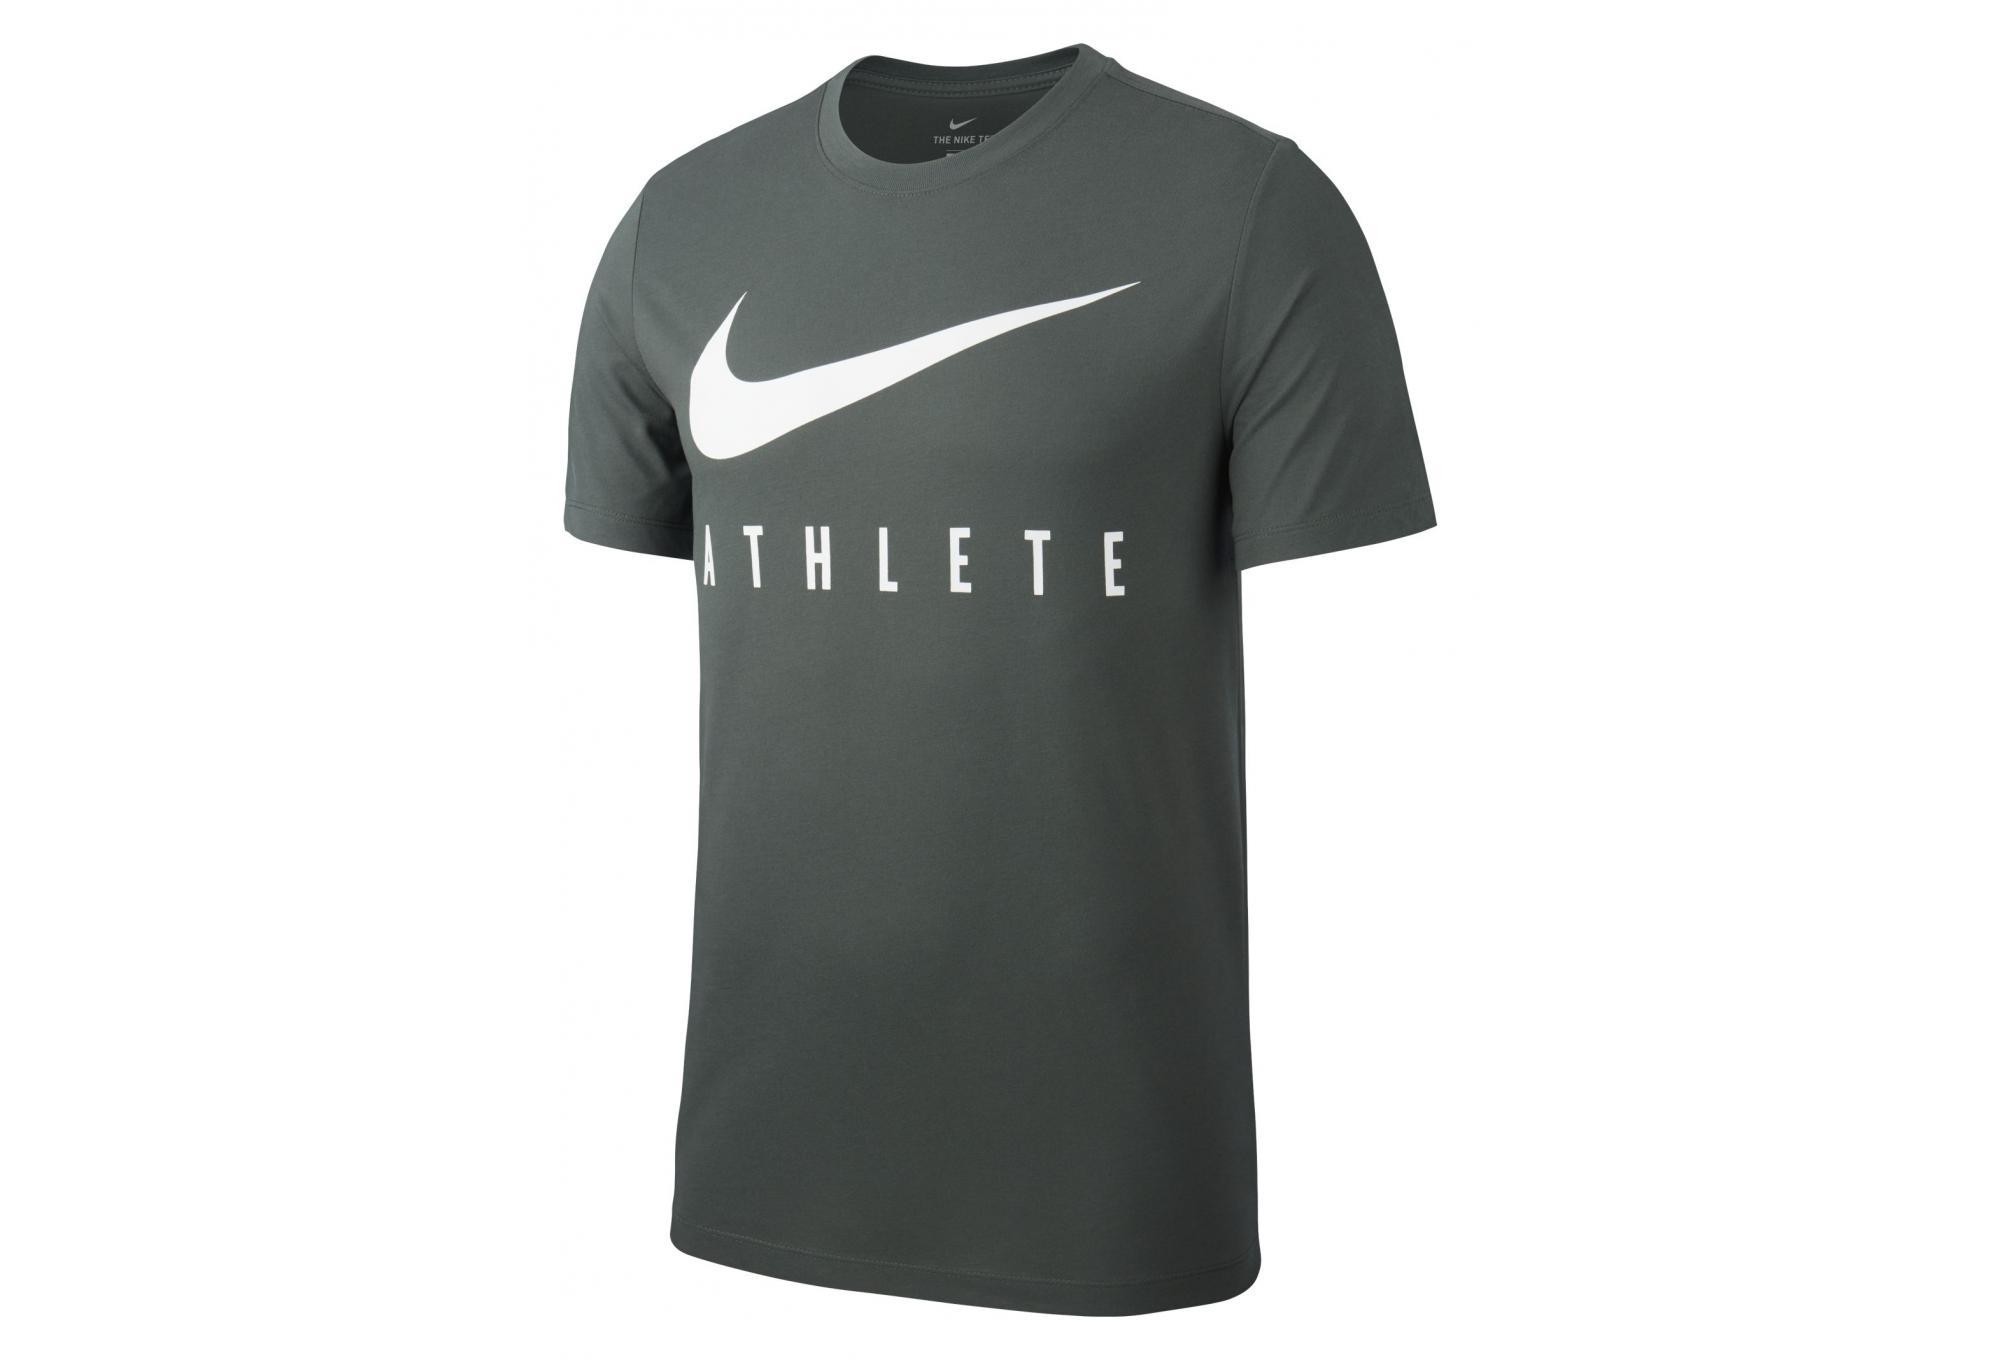 Camiseta de manga corta Nike Dri FIT Athlete Vert Kaki para hombre